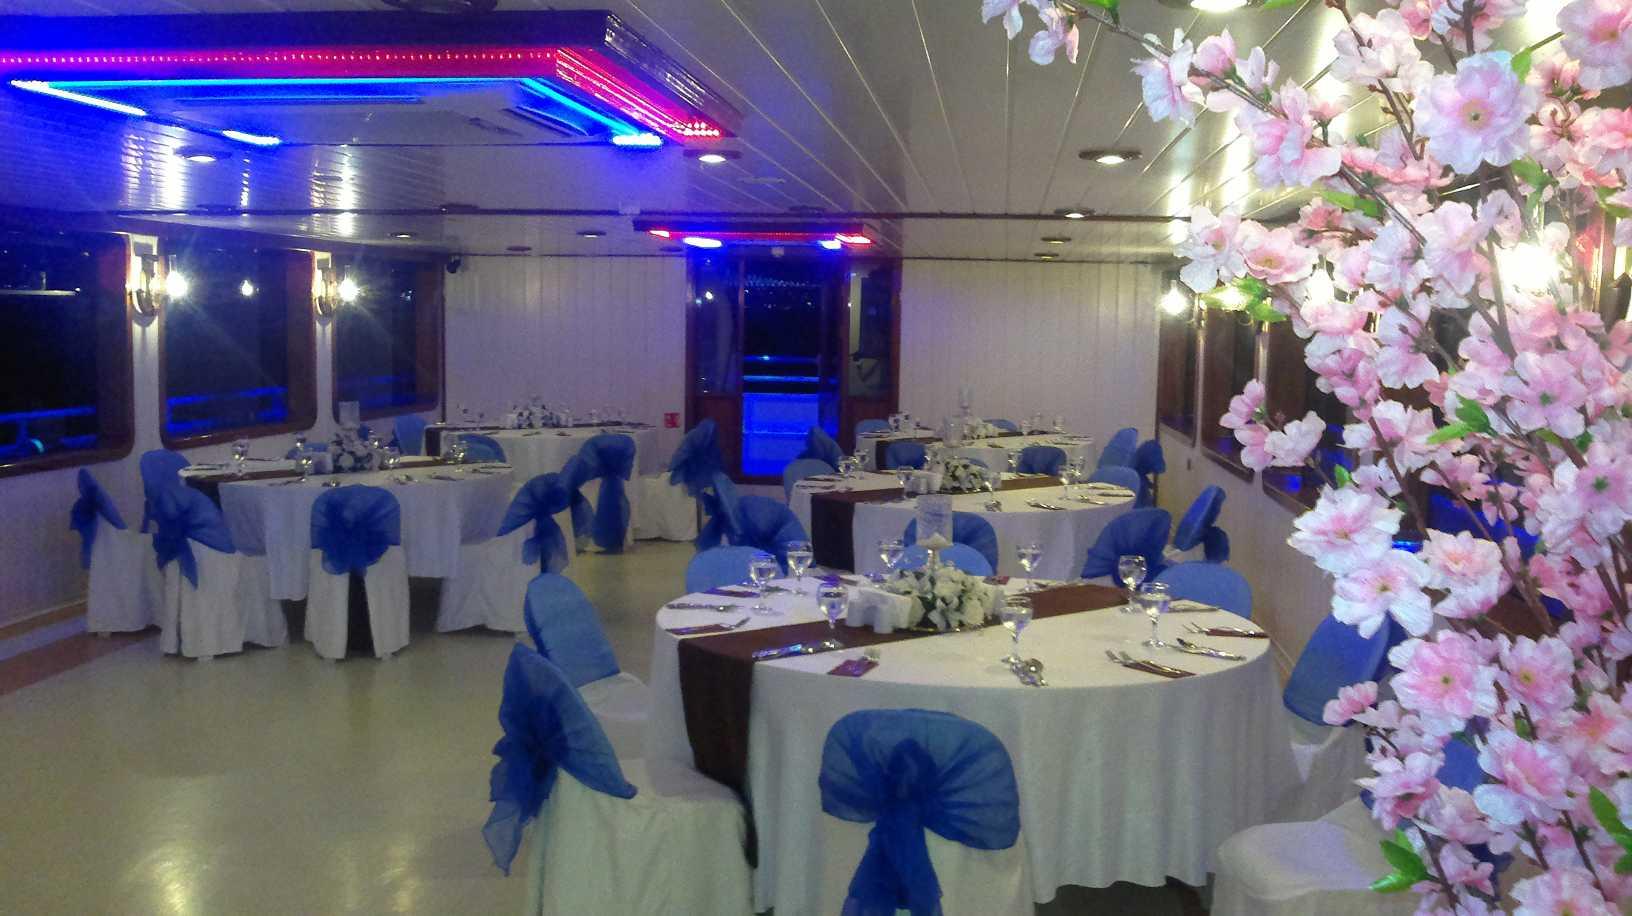 bateau-restaurant-24m-200-passagers-2.jpg